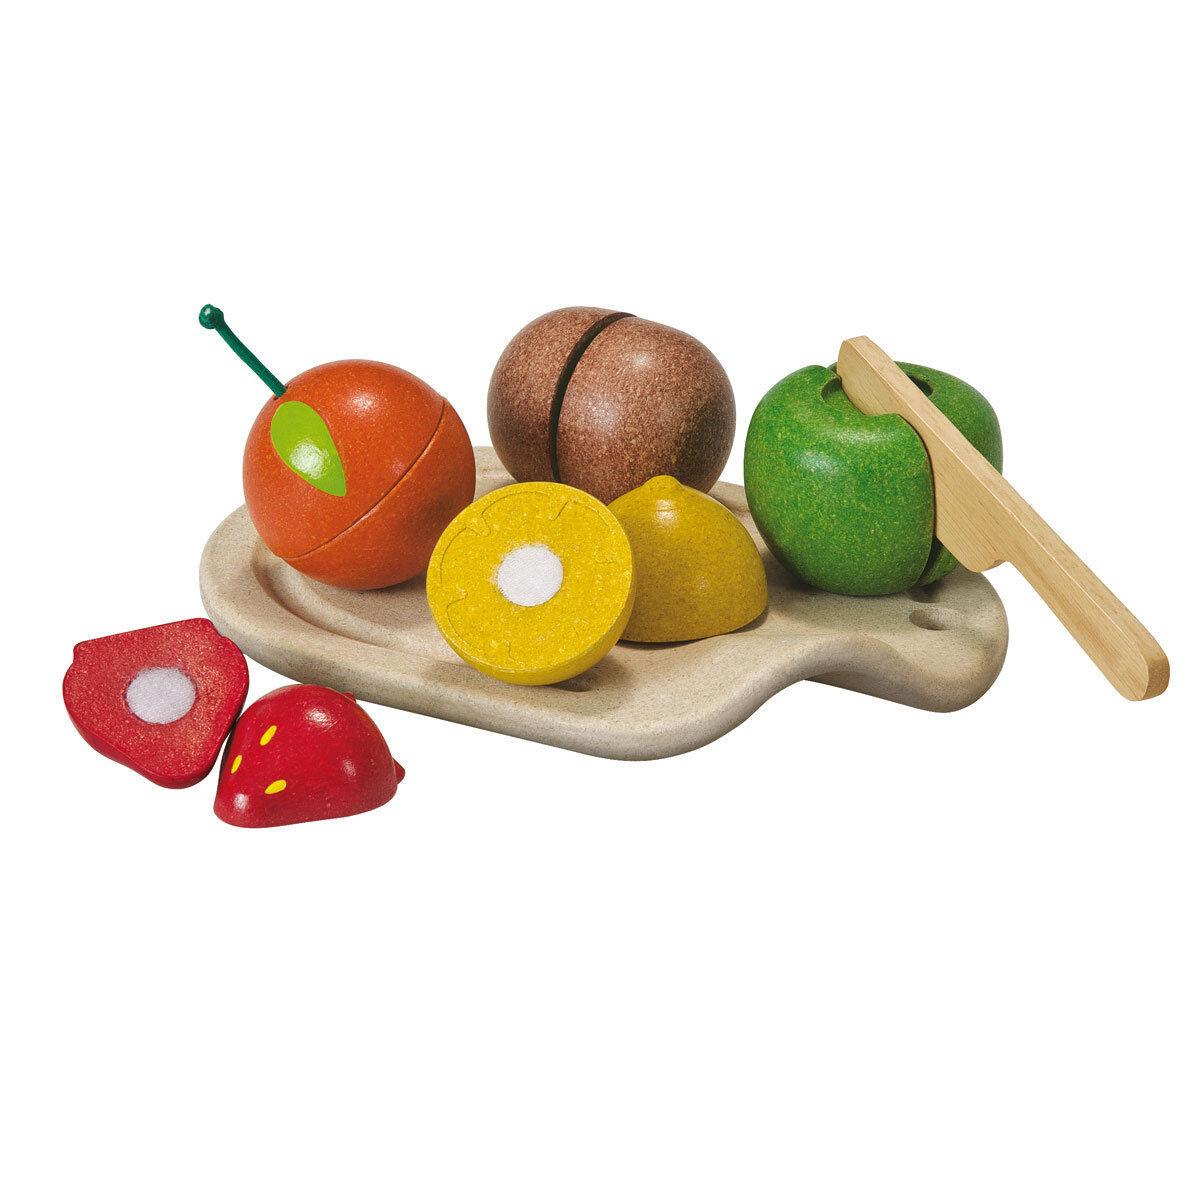 Plan Toys Assortiment de Fruits